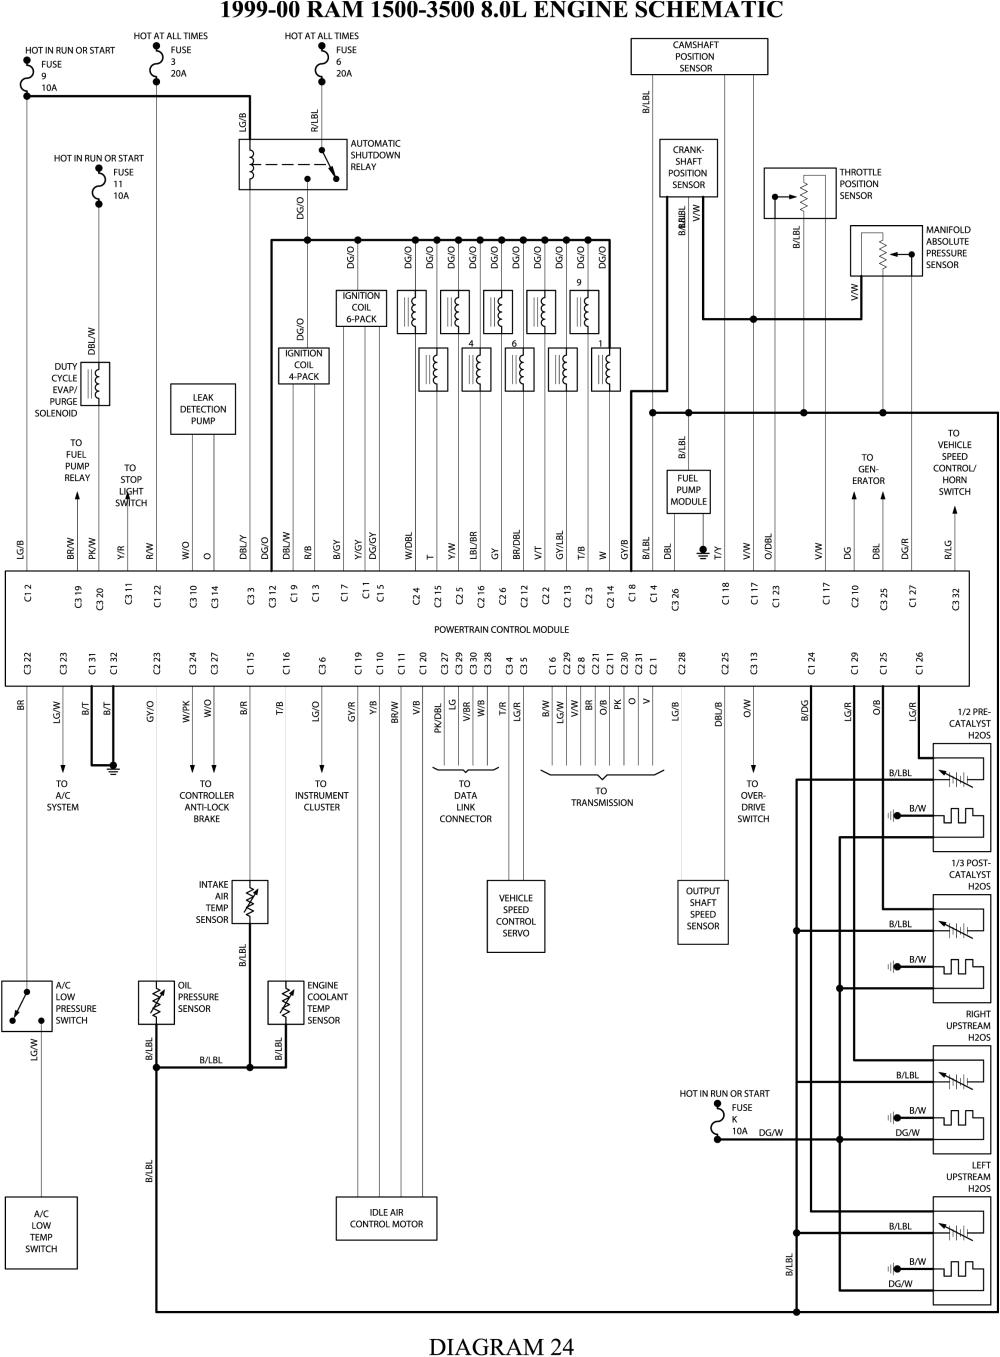 2017 Dodge Ram Trailer Wiring Diagram Dodge Ram 2500 Trailer Wiring Wiring Diagram